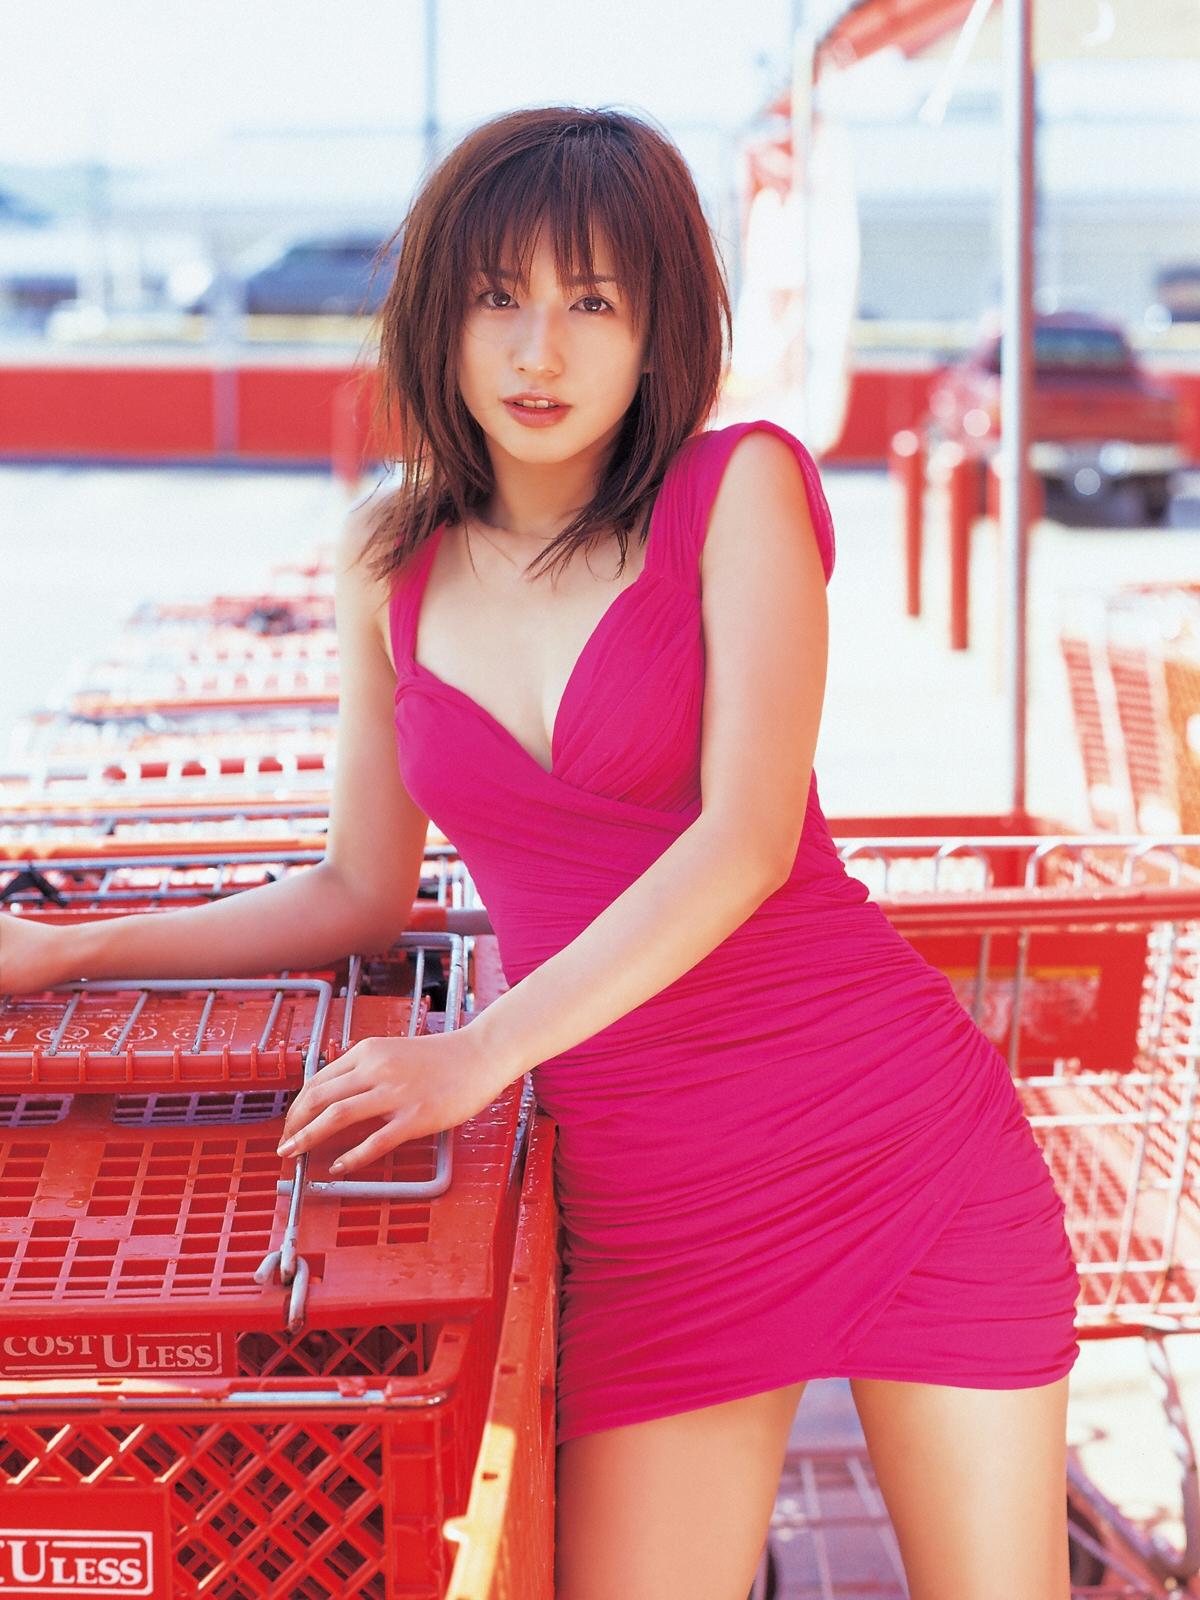 c8bb12 [HF/UPL] Maomi Yuuki - Sabra.net 優木まおみ [2008.03][28.0 MB] hfupl 07280